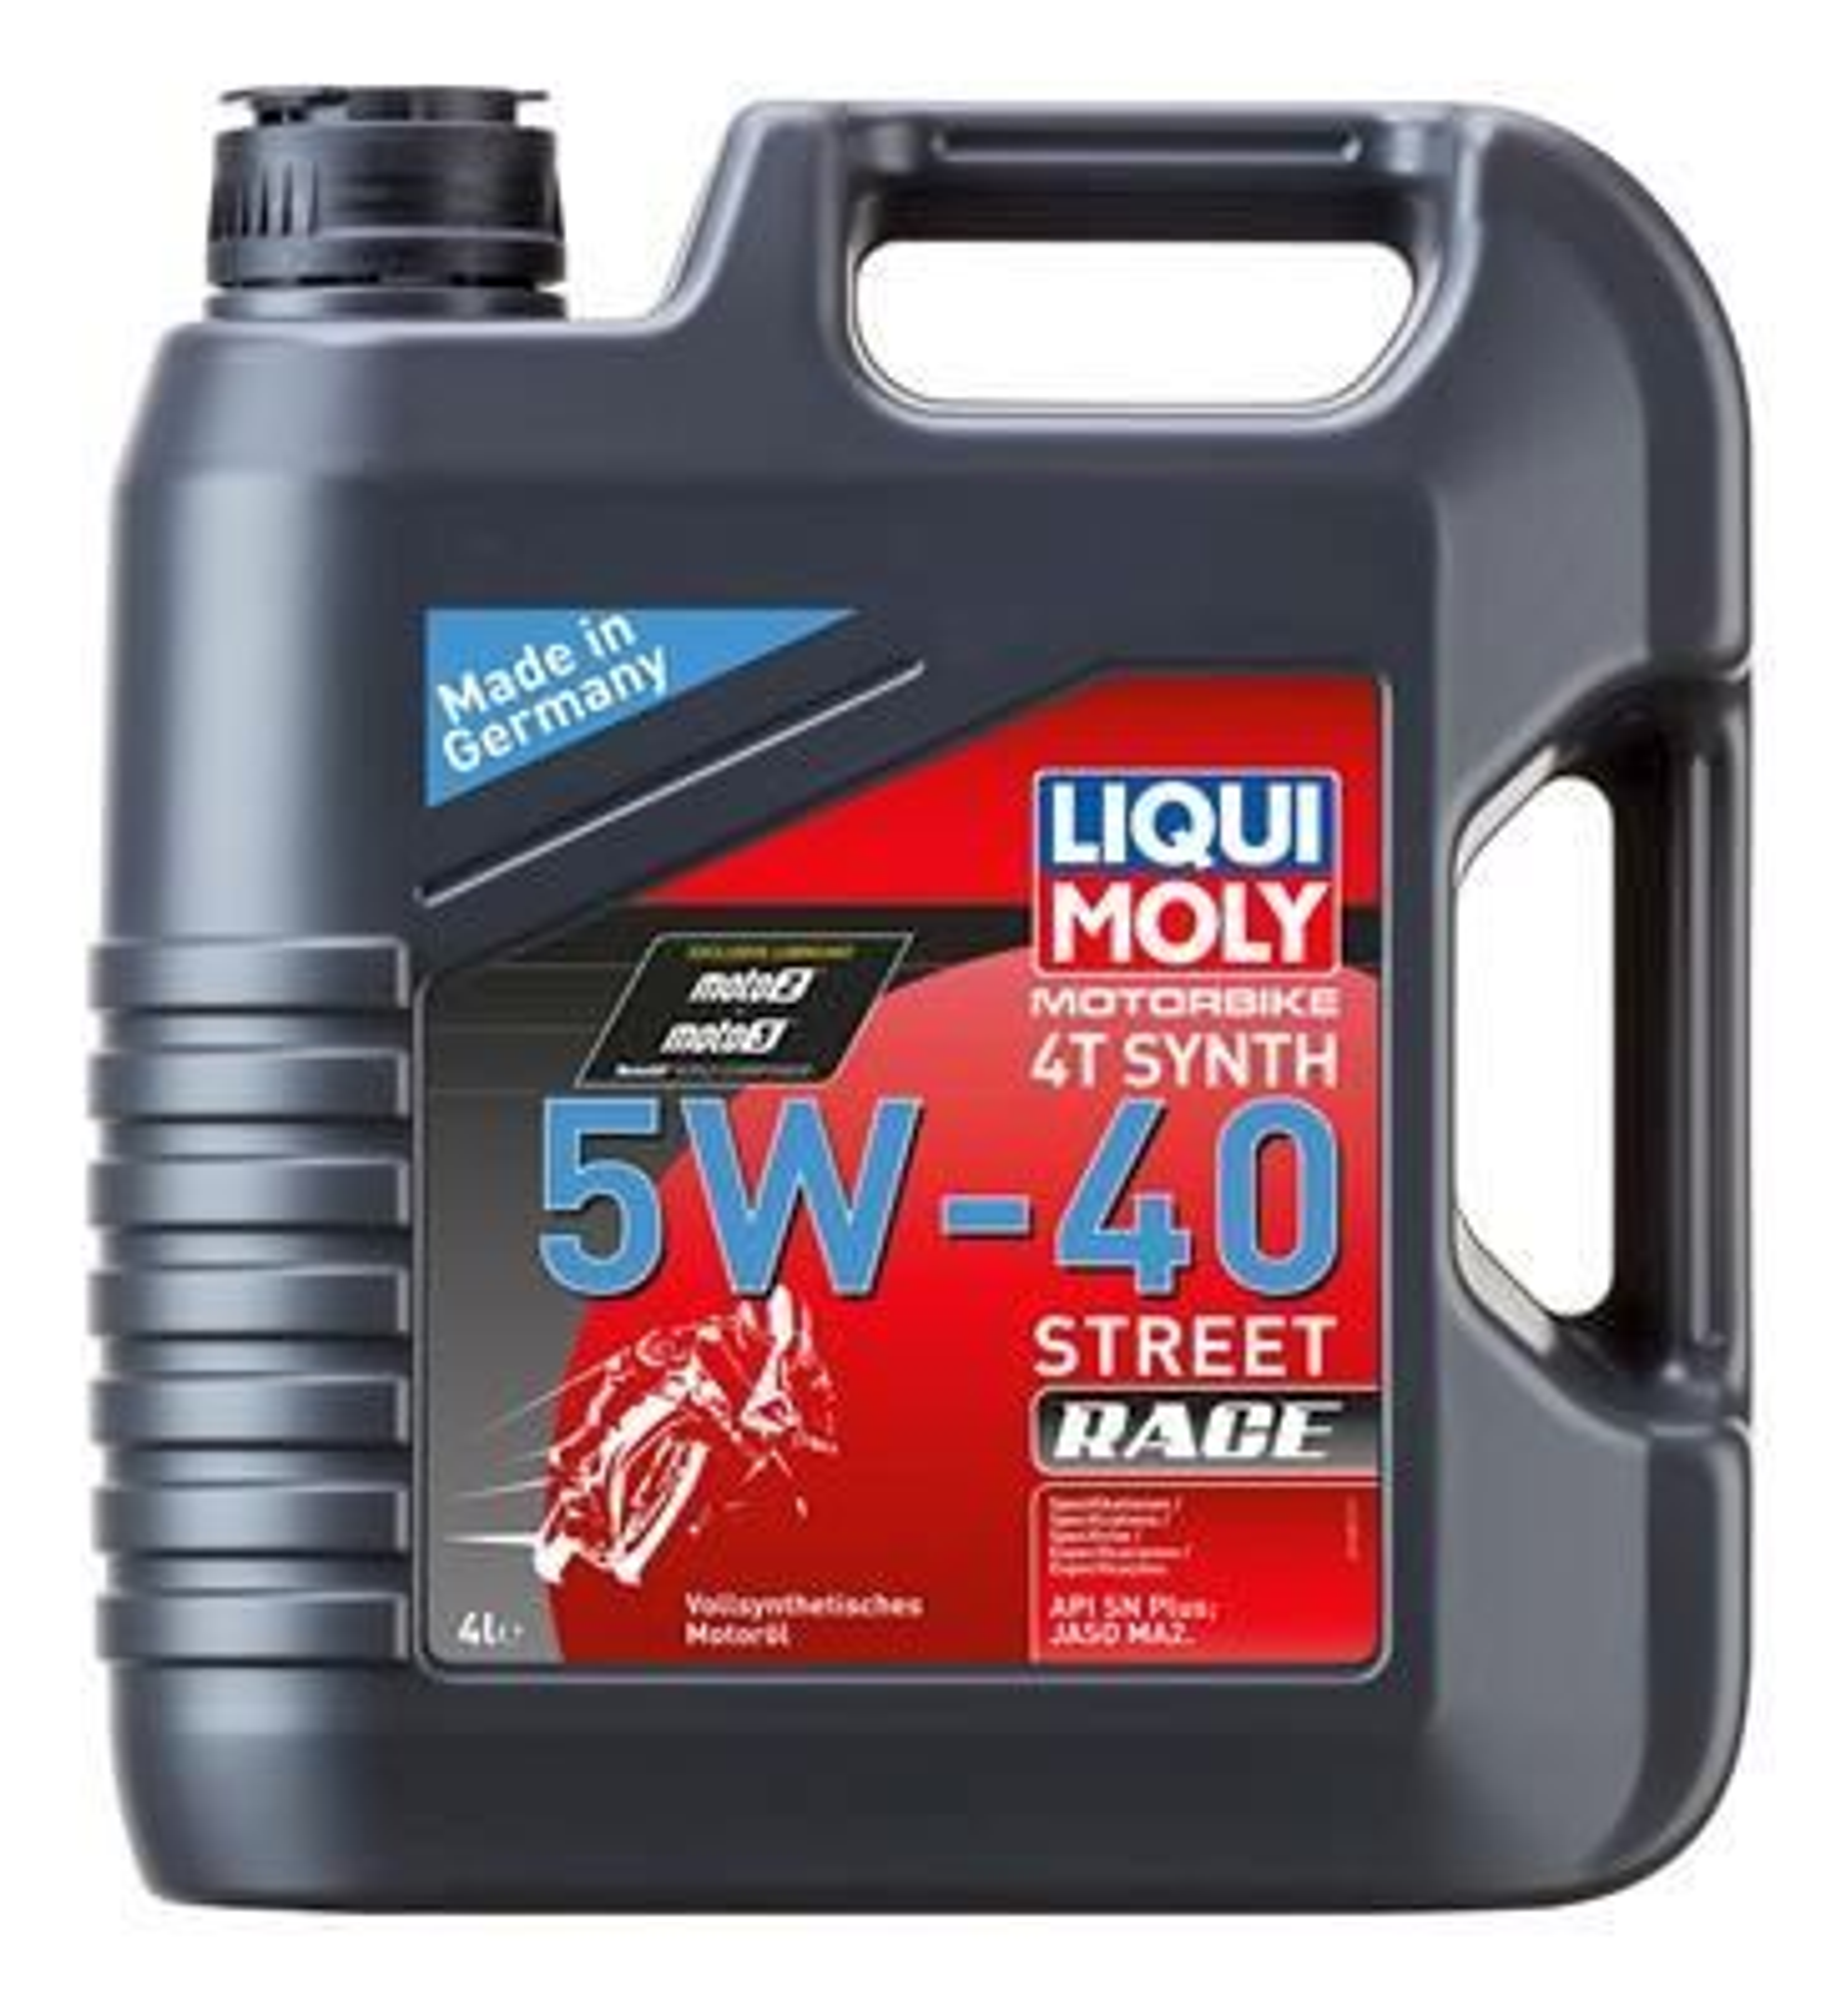 LIQUI MOLY Motorbike 4T Synth, Street Race Olej silnikowy 5W-40, 4l 1685 SYM